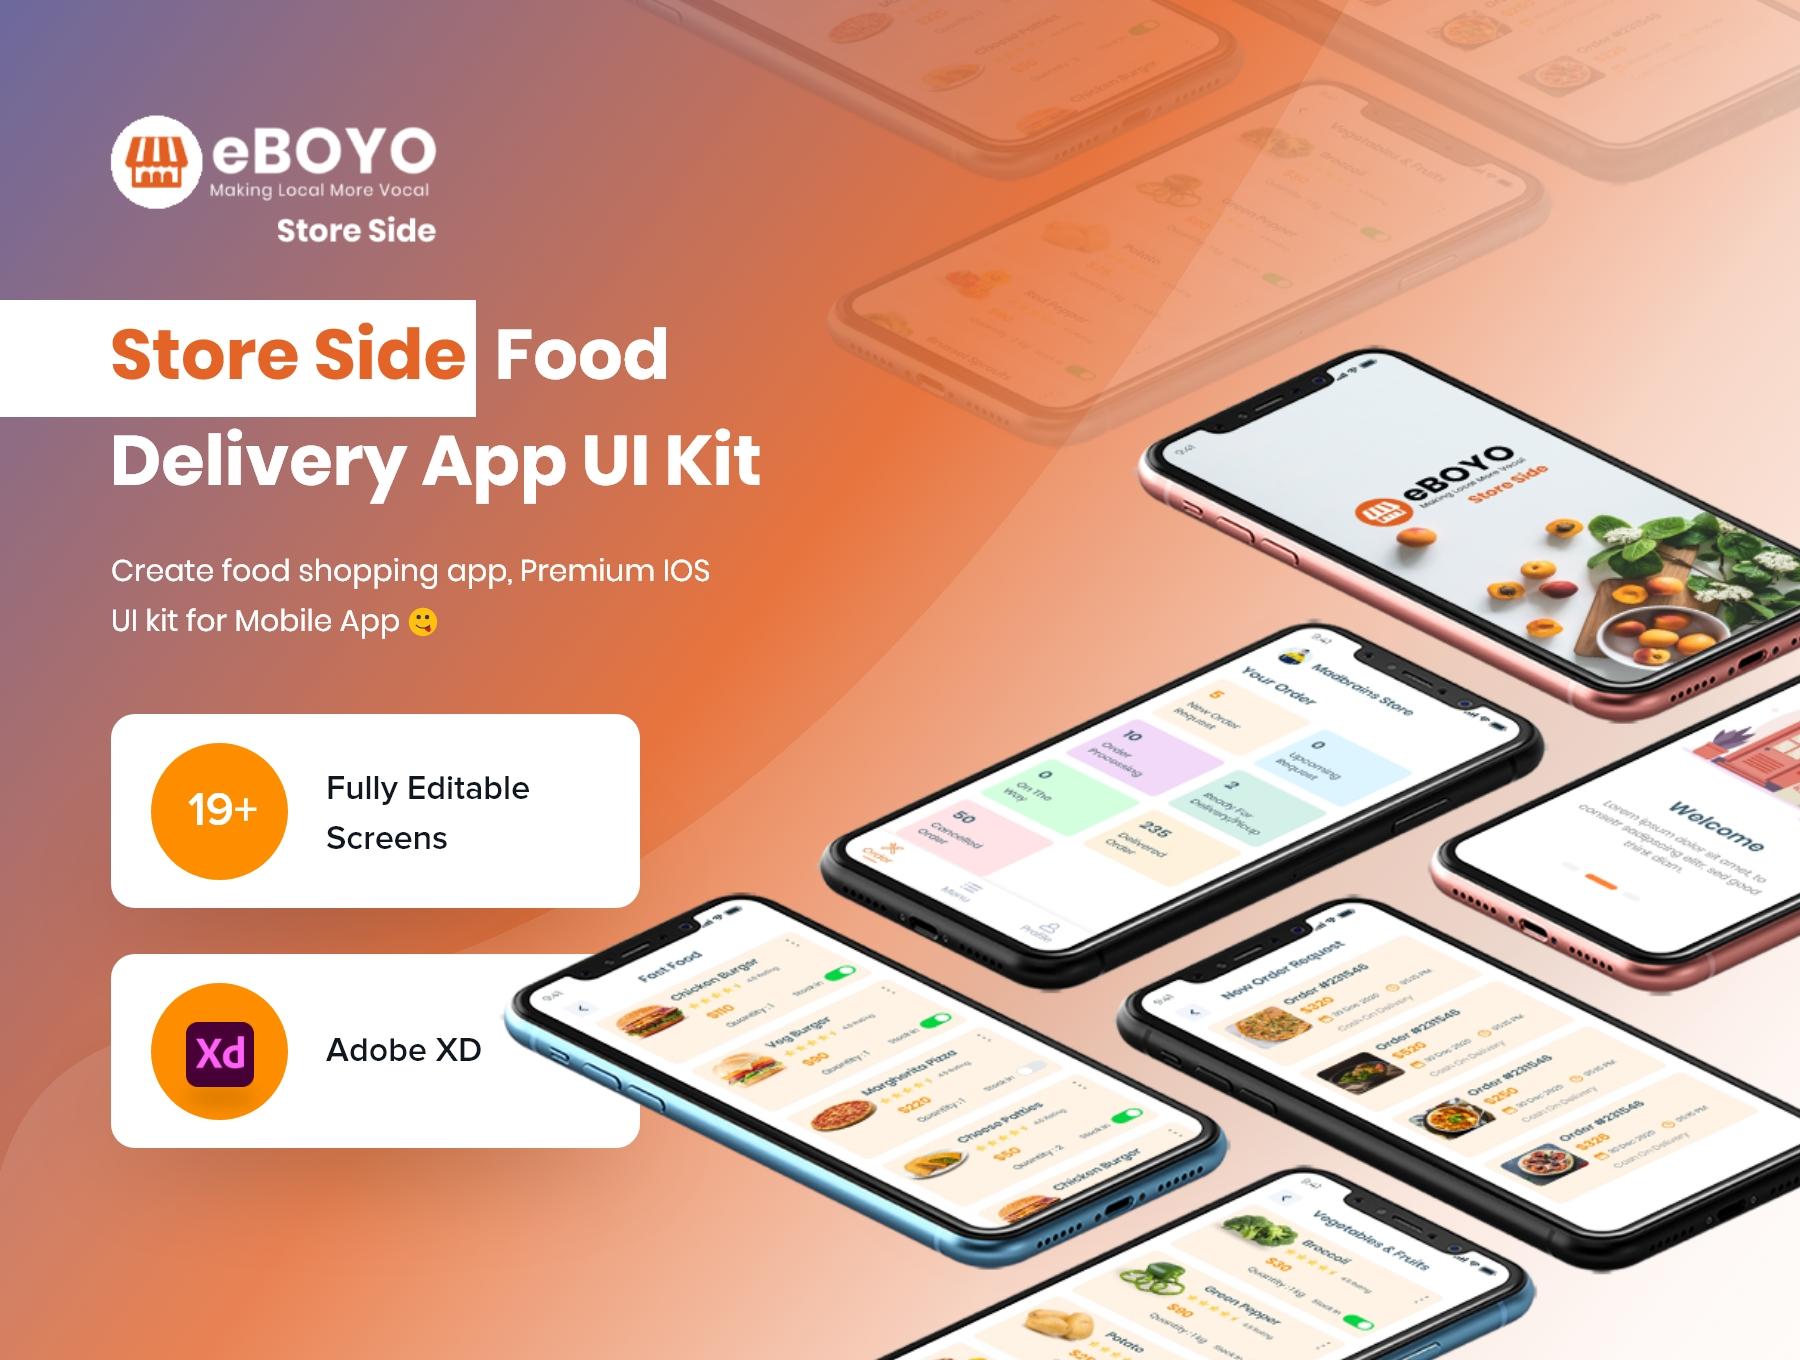 eBOYO Store View - Best Seller Side Ecommerce UI Design Template Premium UI Kit For Adobe XD